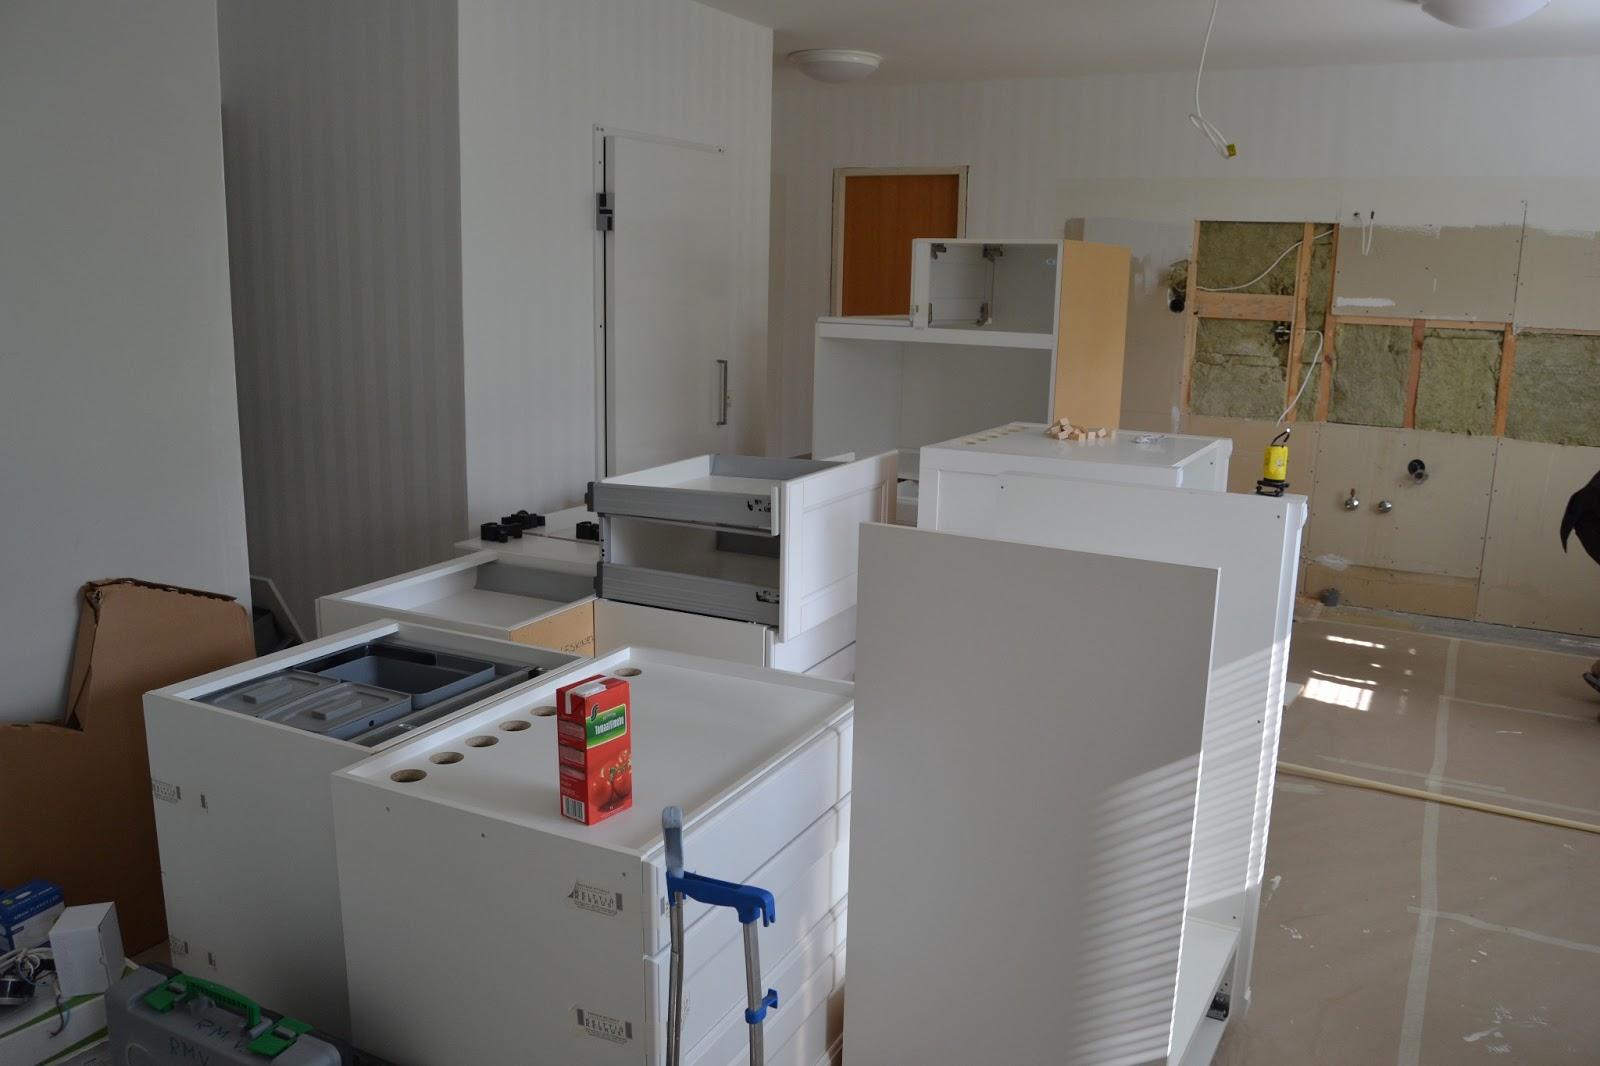 Keittiöremppa etenee.. – Our kitchen today..